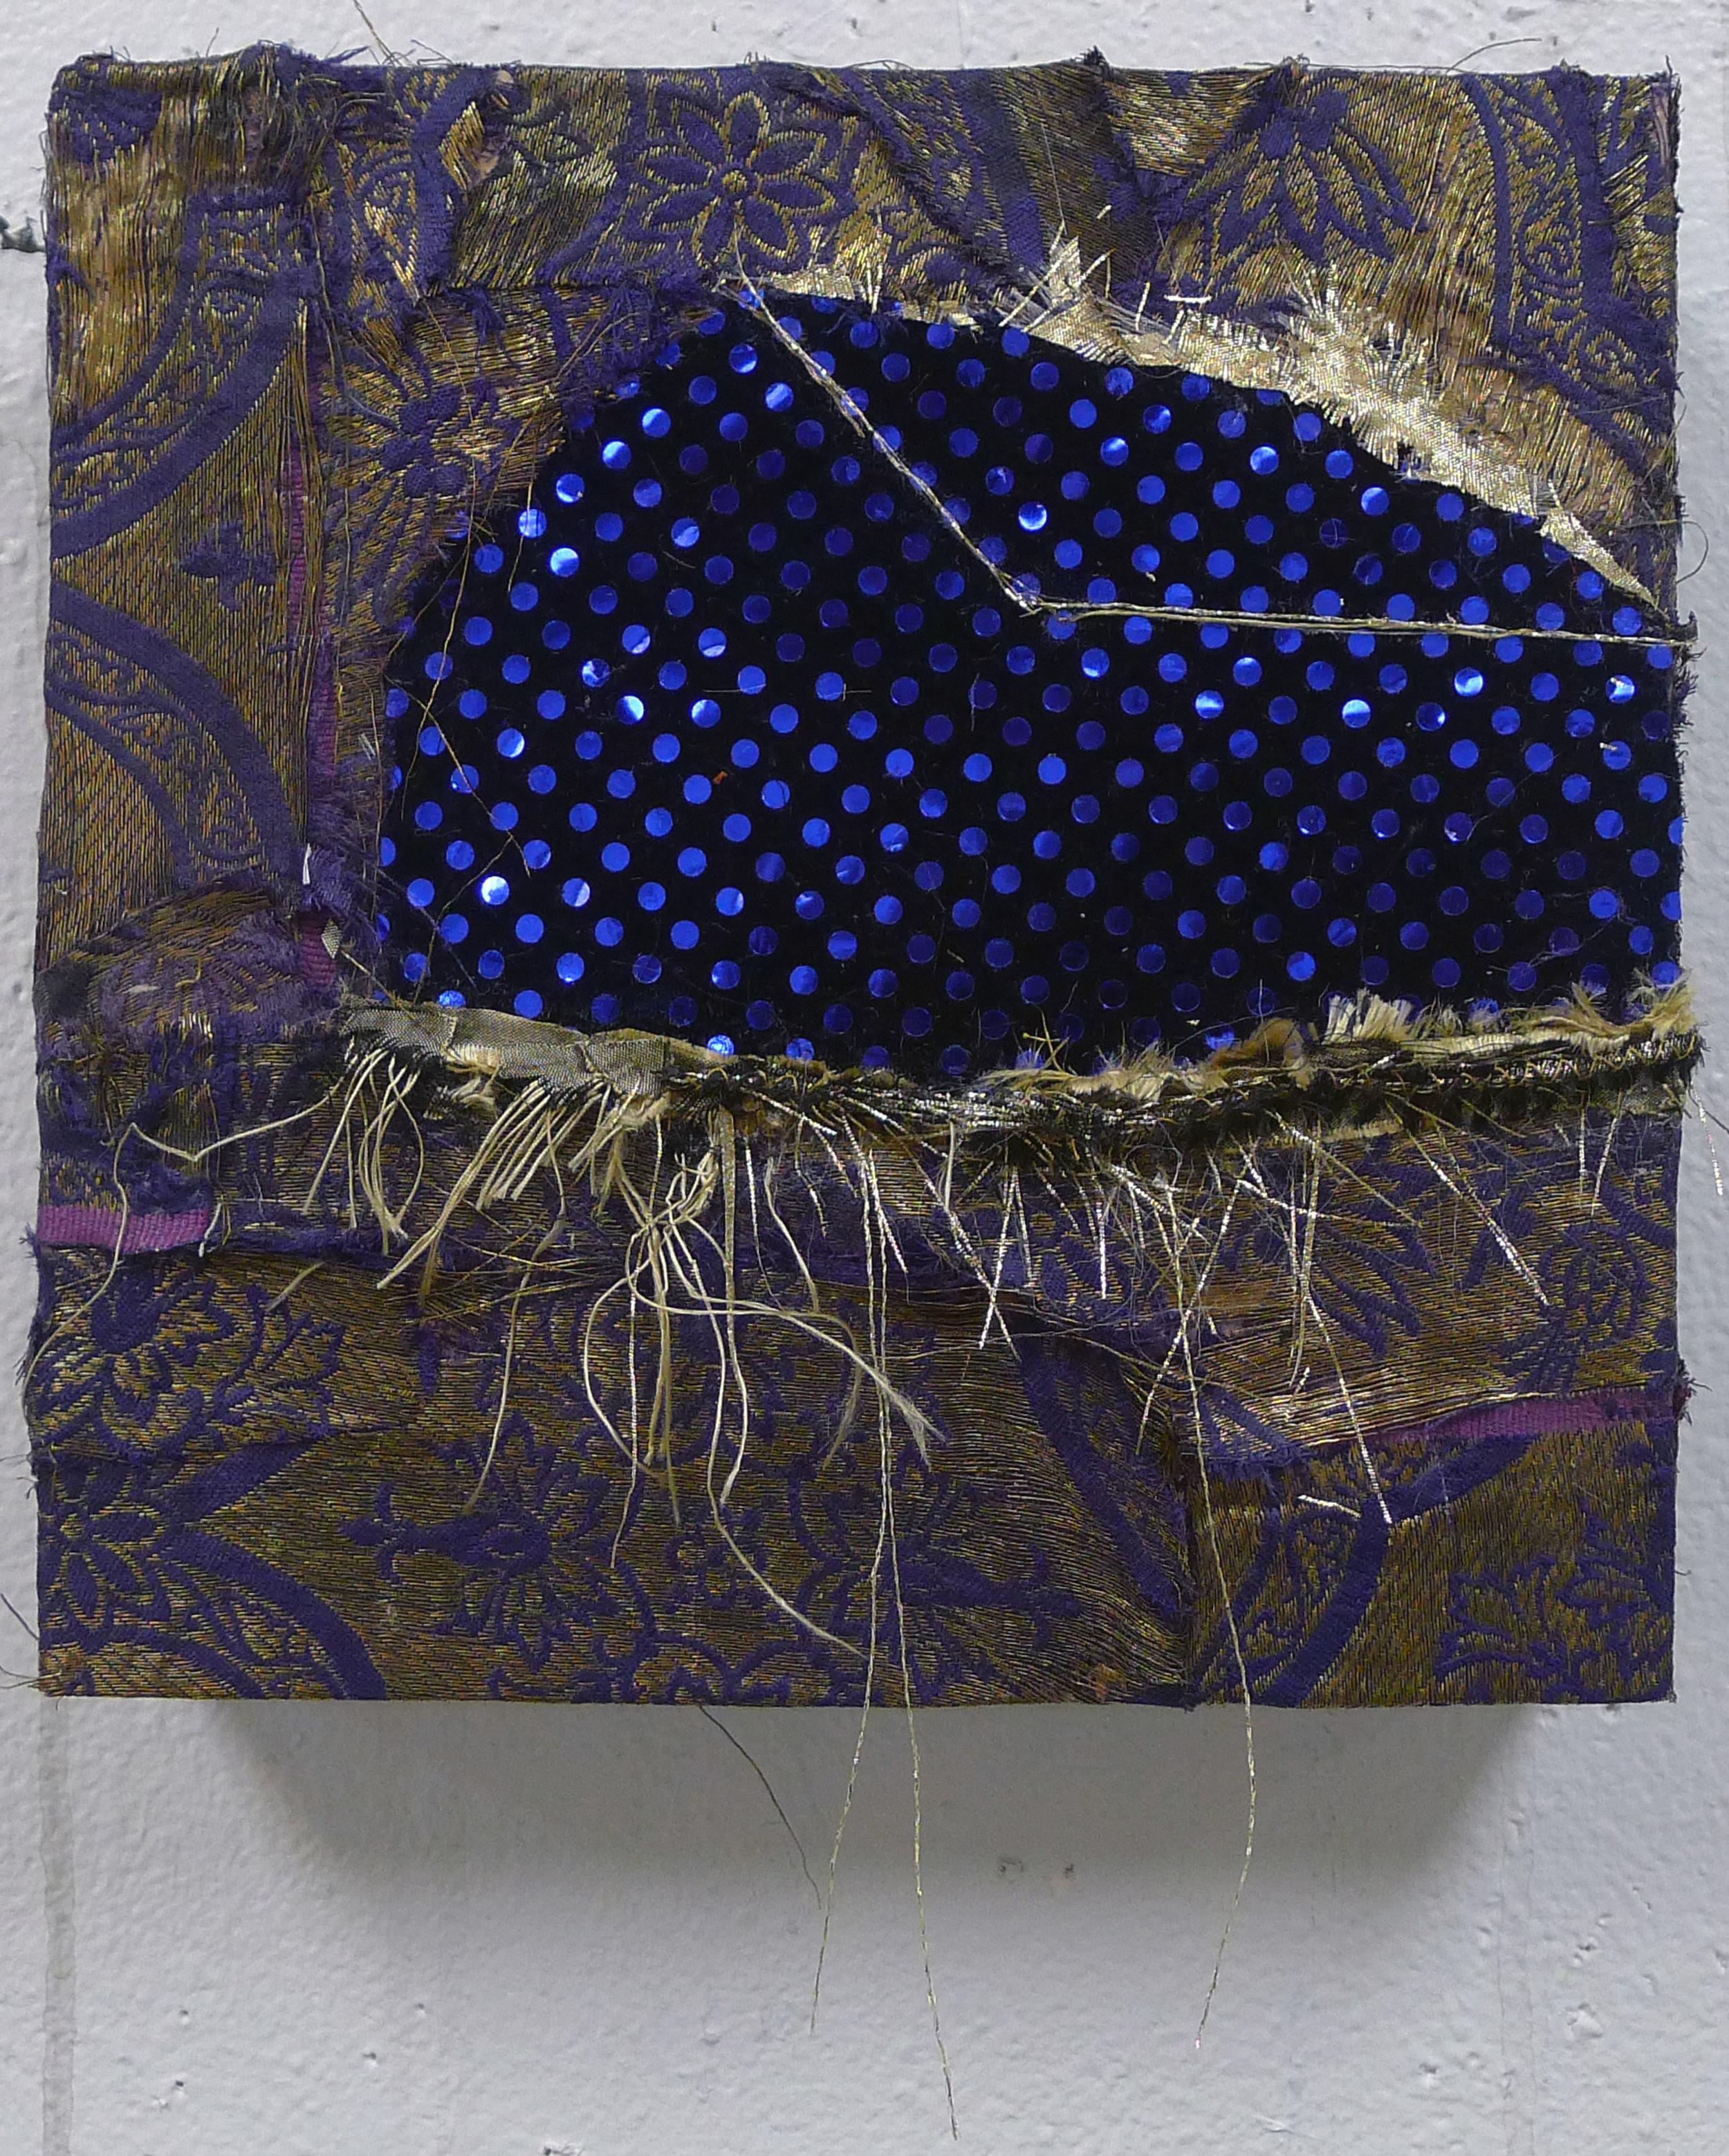 Brenda Cirioni,  Dream House: Midnight, Fabric and sequins, 8x8